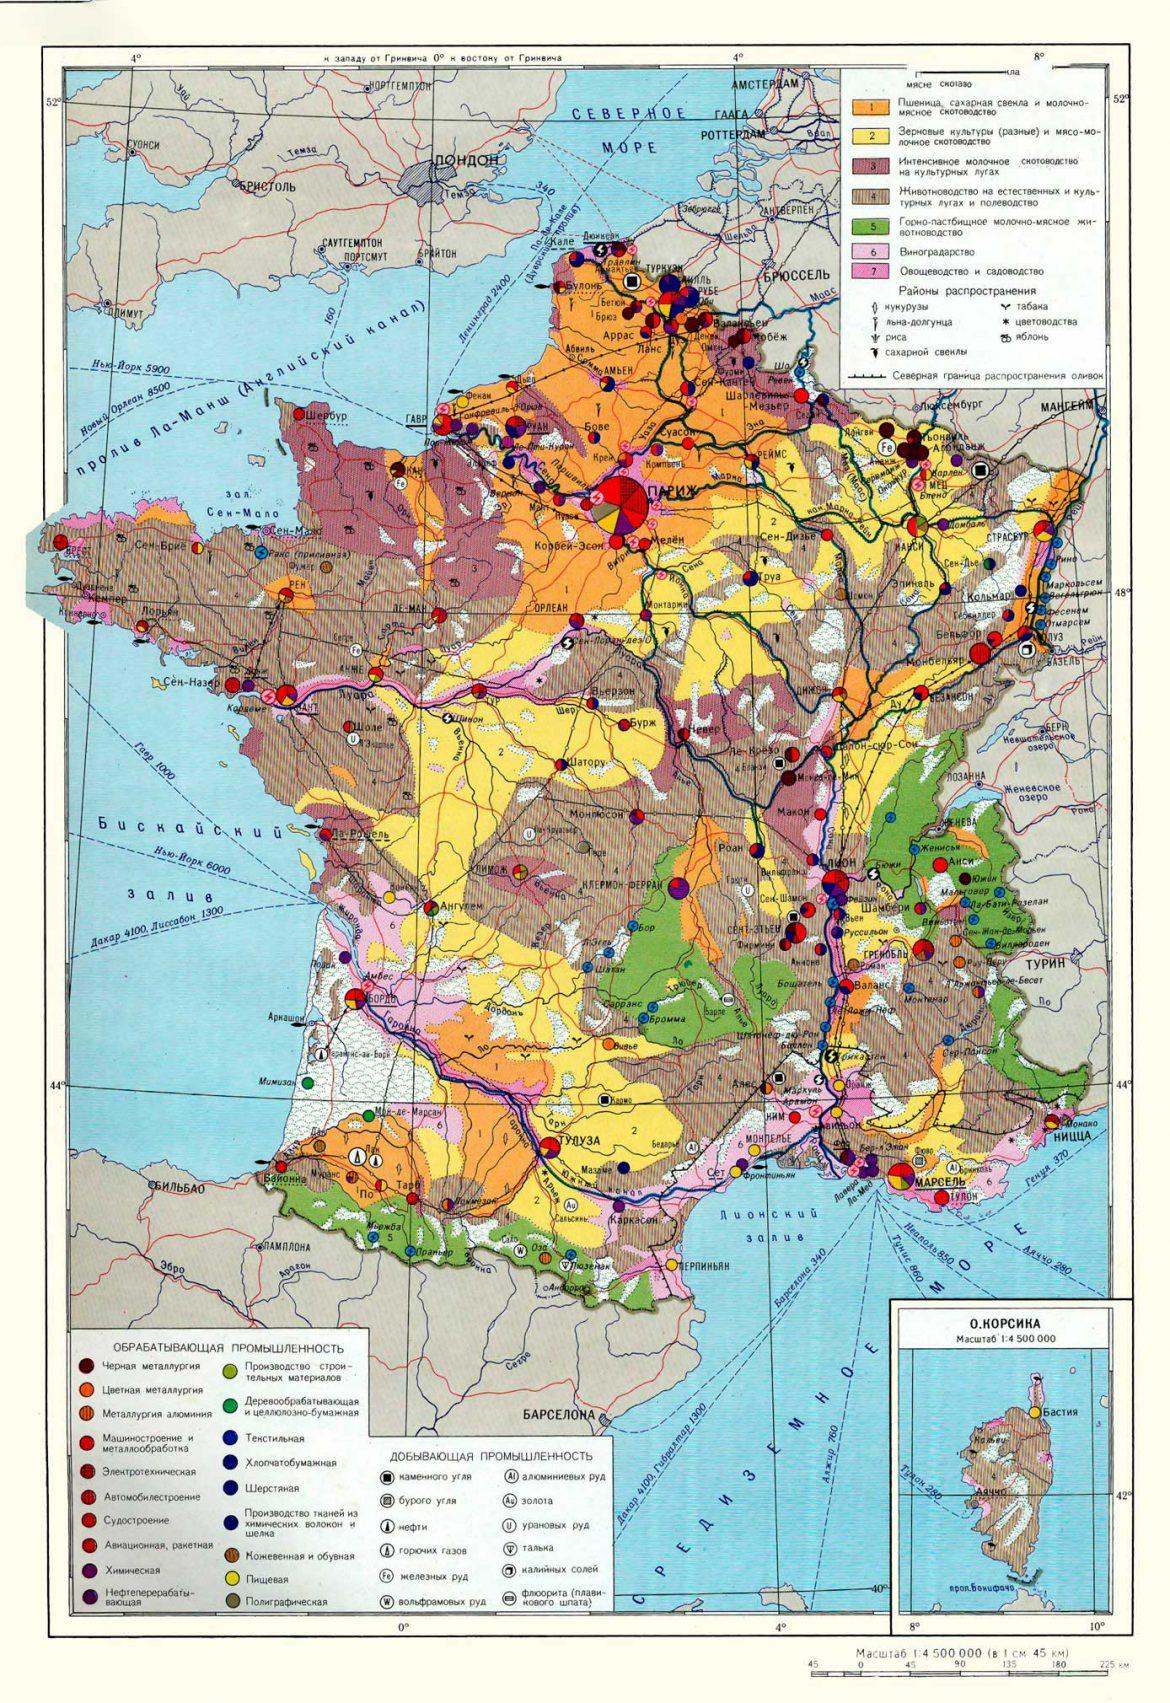 Франция на экономической карте